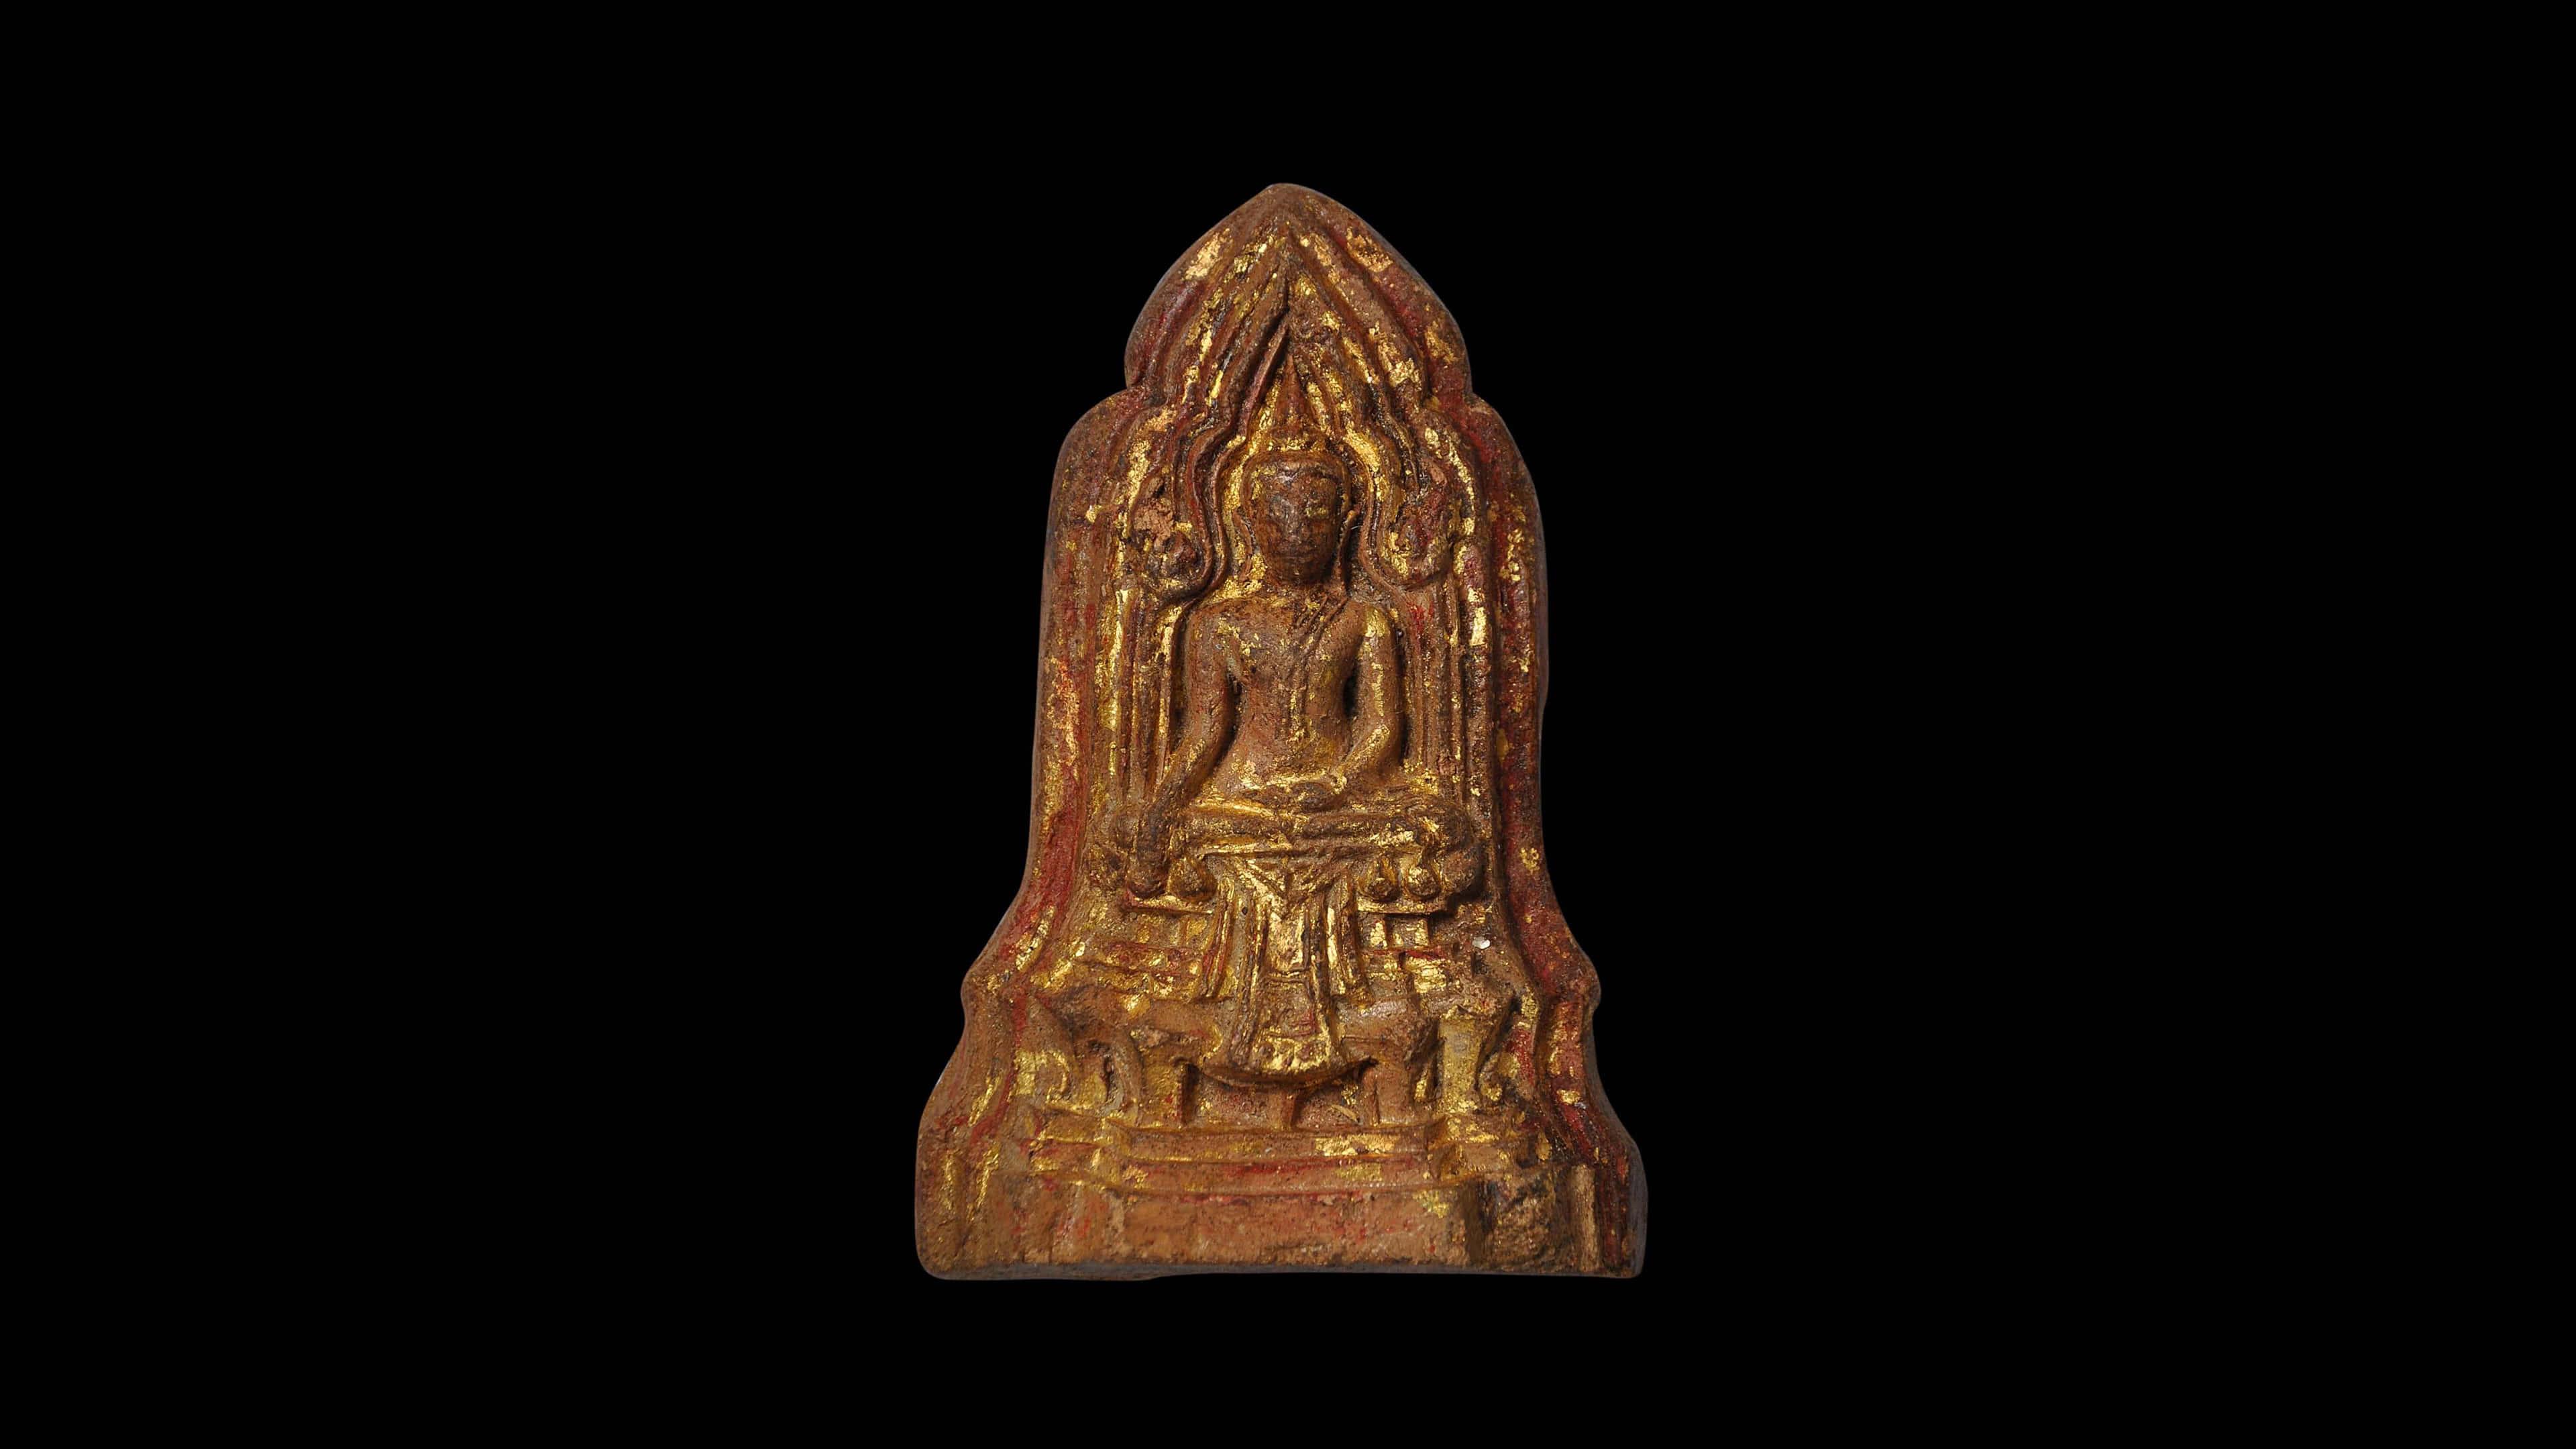 thai buddhist amulet uhd 4k wallpaper